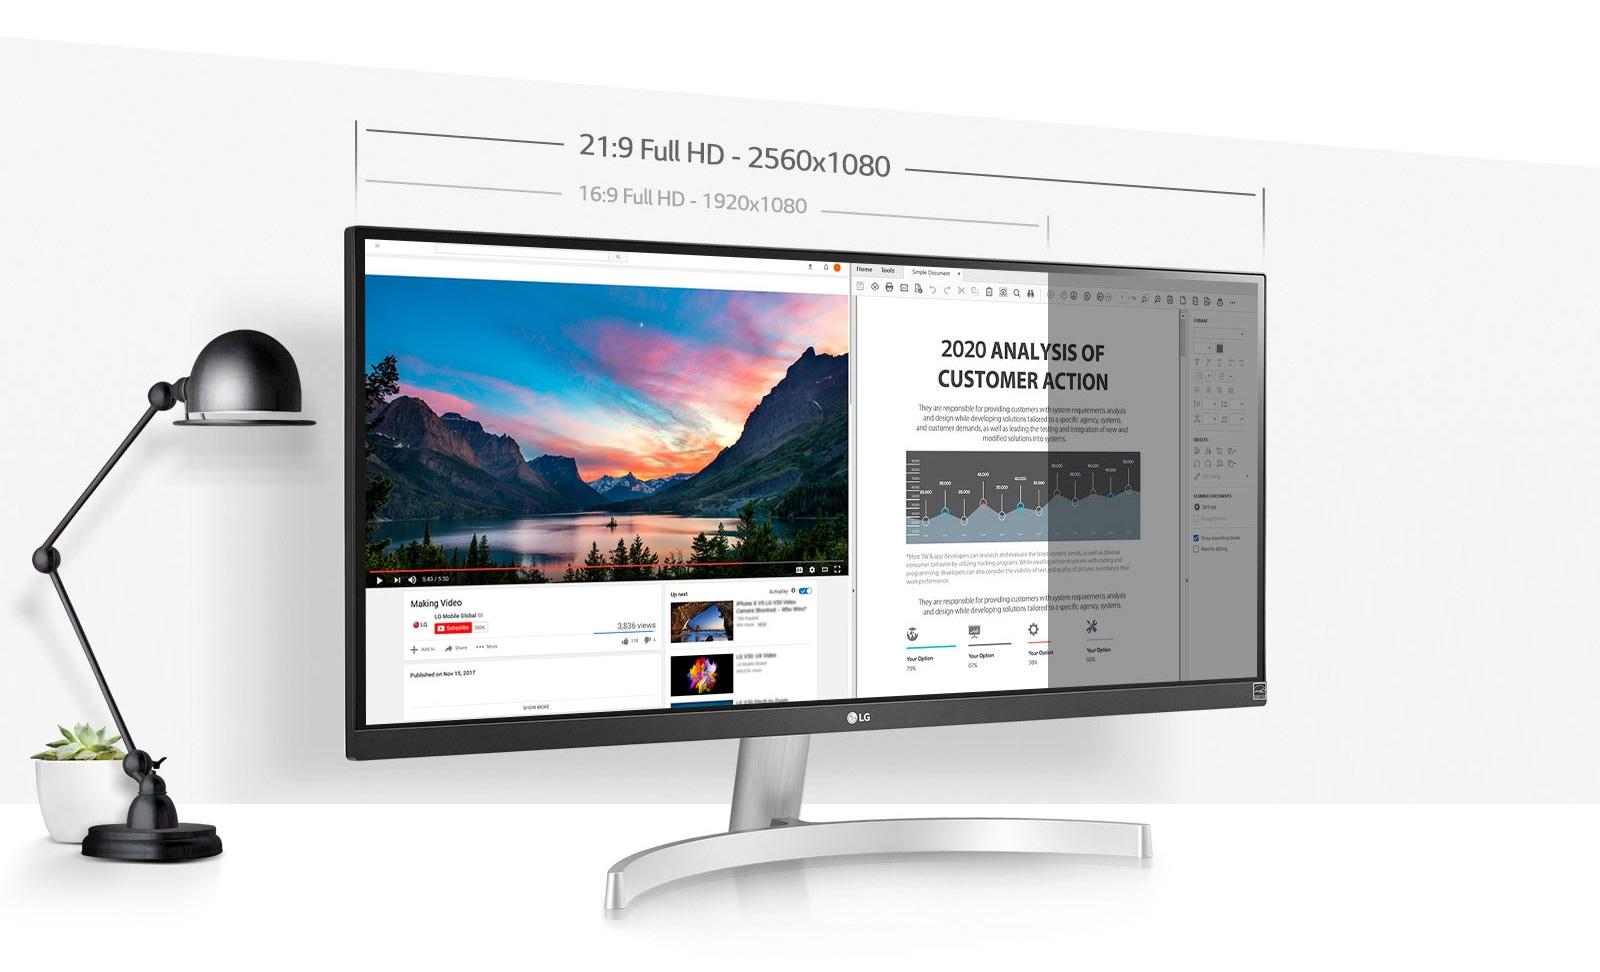 La pantalla UltraWide™ Full HD de 29